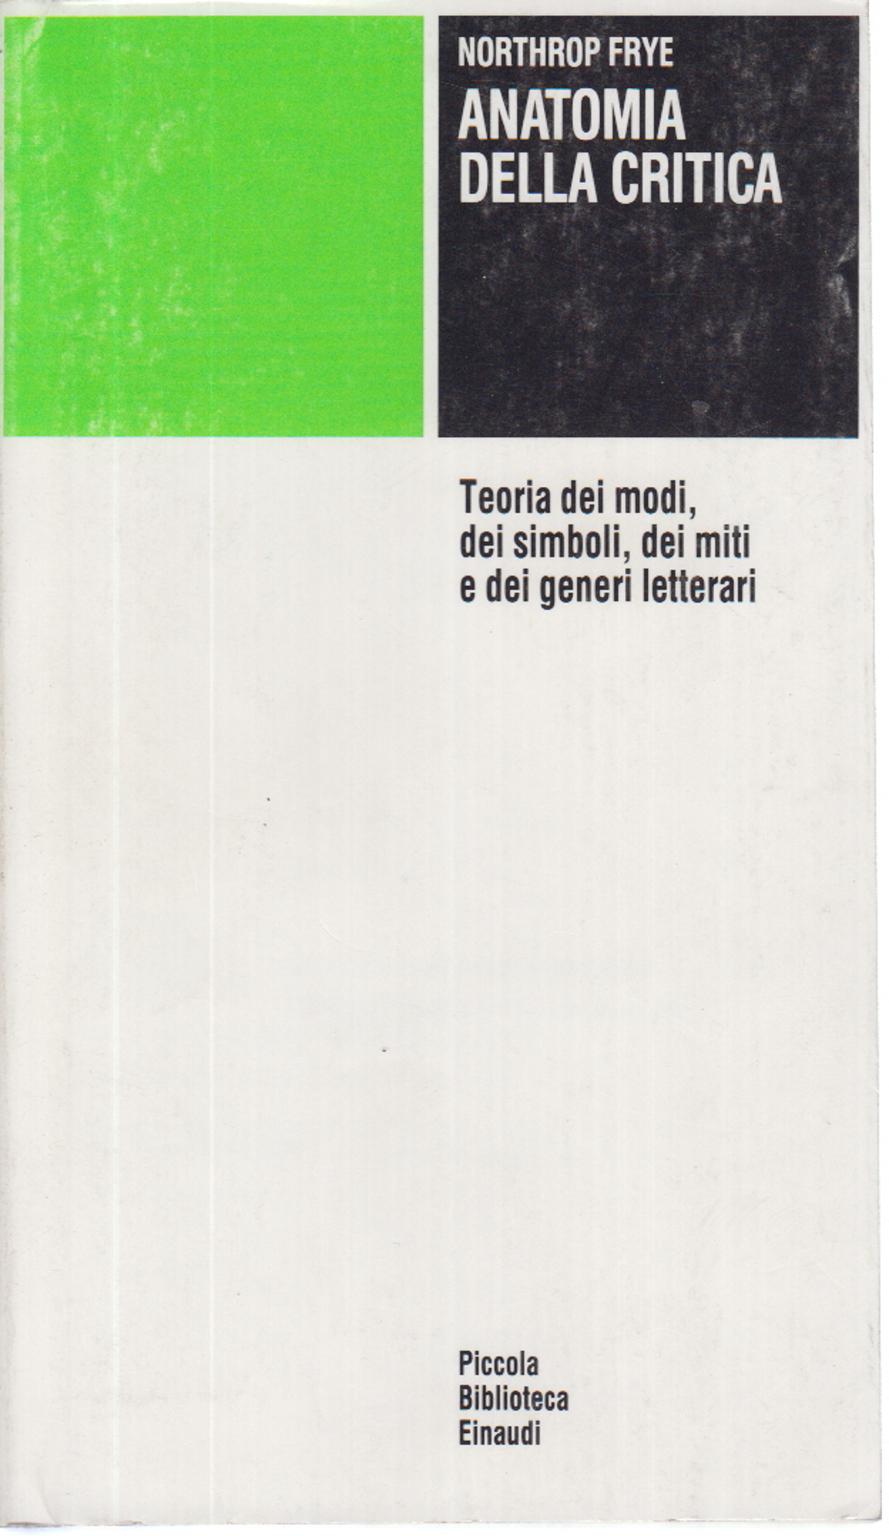 Anatomy of criticism. Four essays - Northrop Frye - Literary genres ...